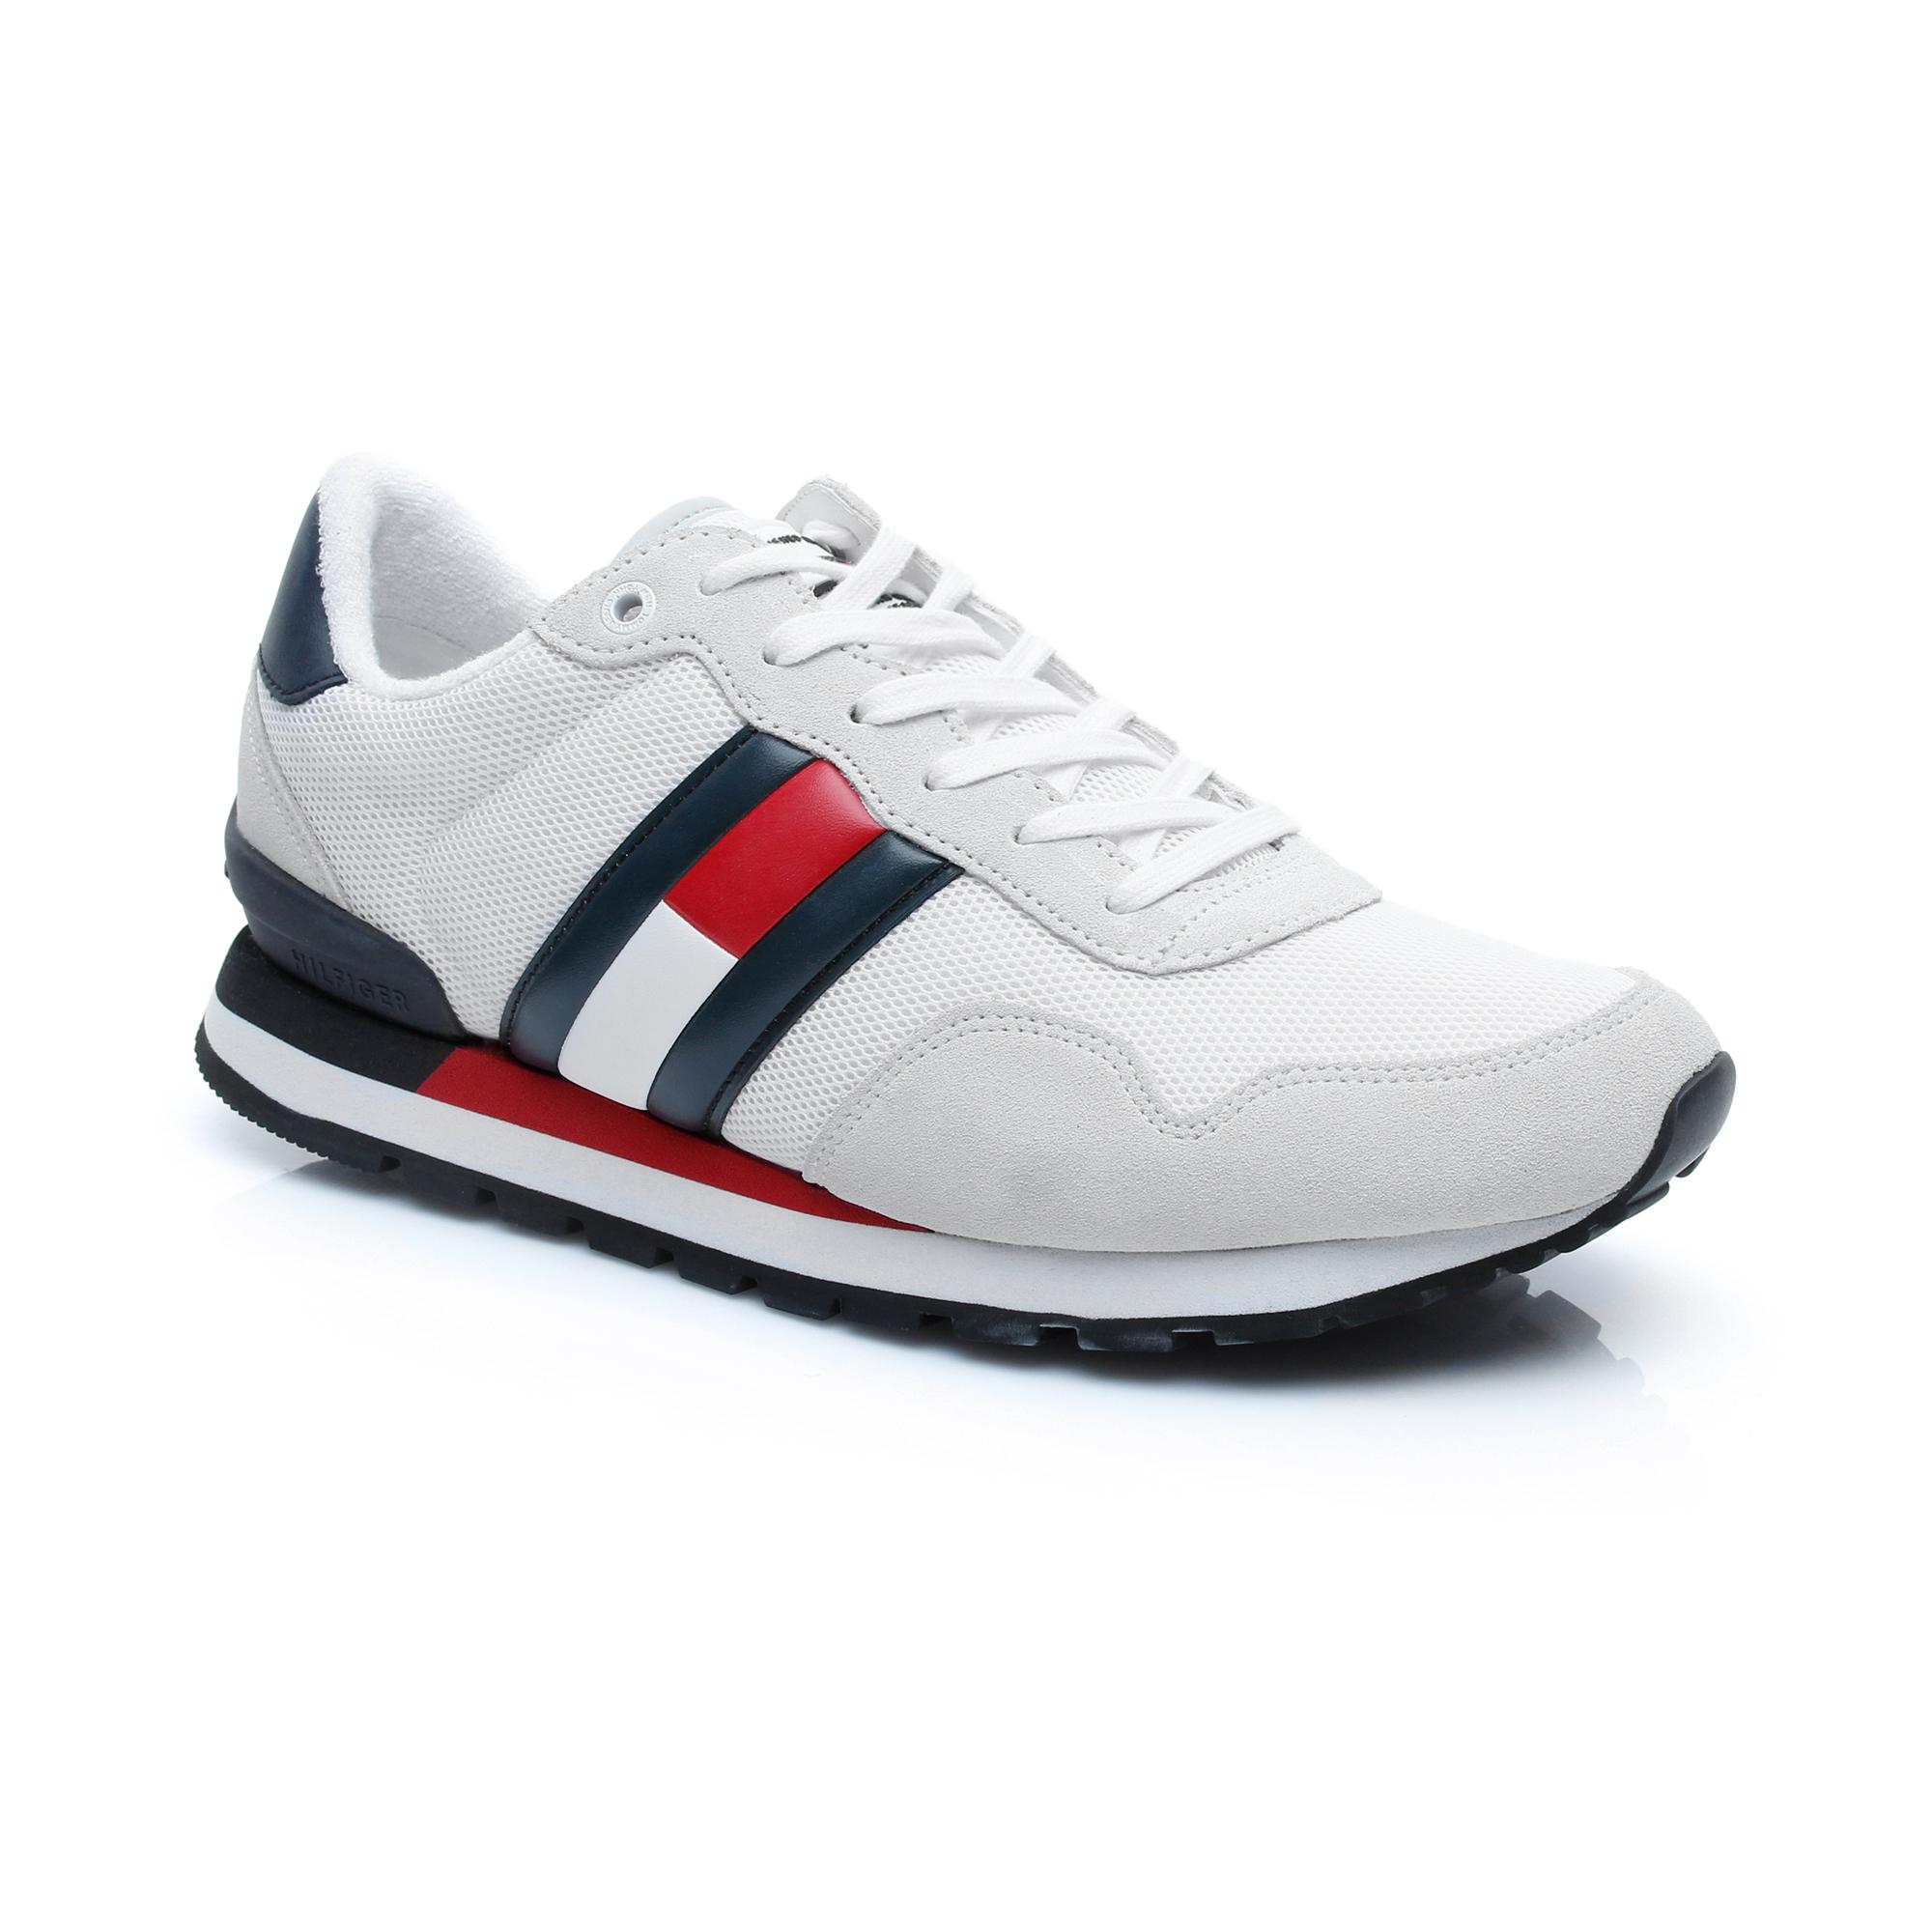 Tommy Hilfiger Casual Jeans's Erkek Beyaz Spor Ayakkabı